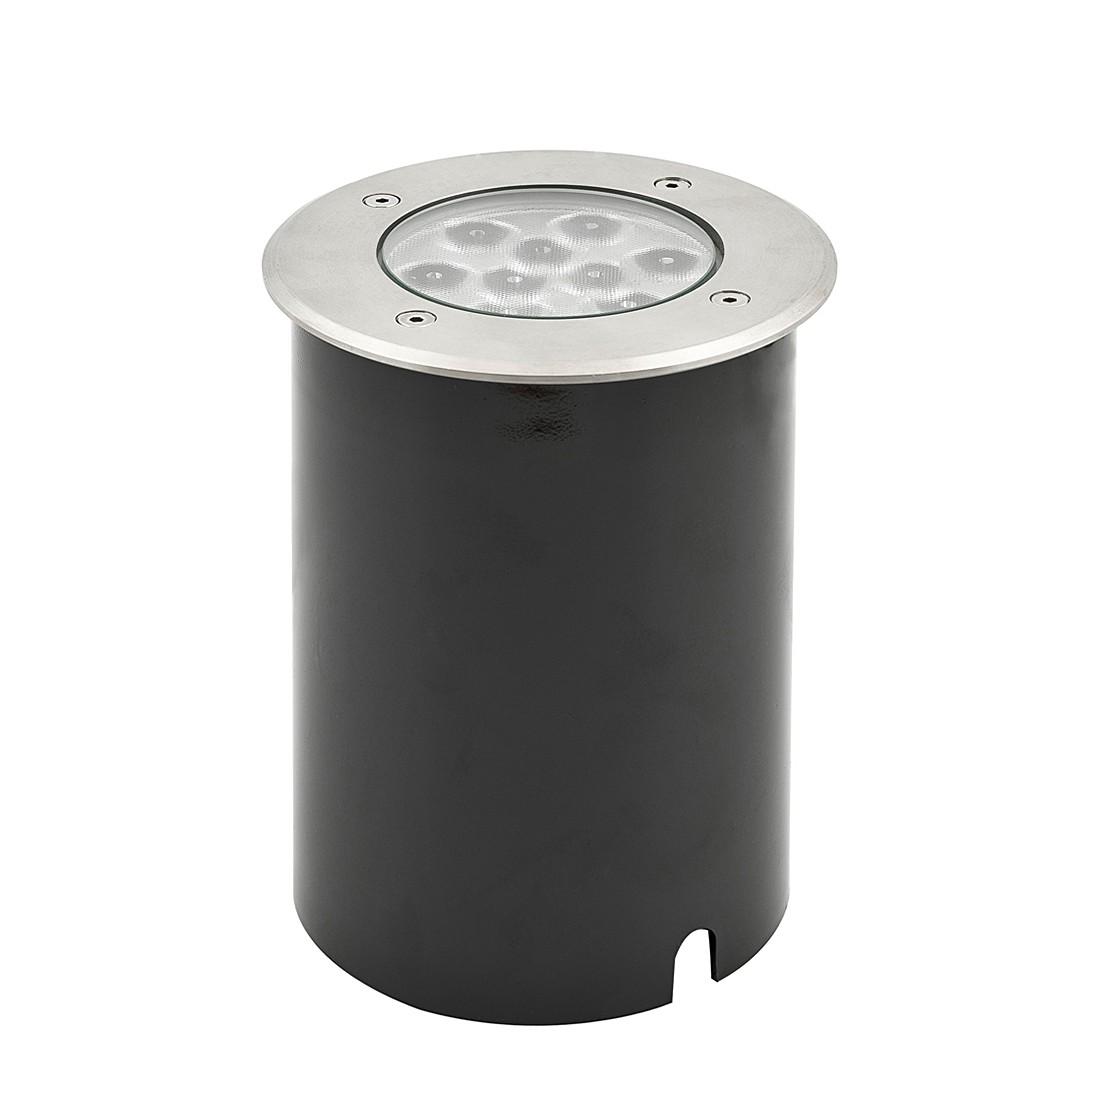 LED Bodeneinbaustrahler ● Aluminium/Glas ● 9-flammig- Konstsmide A+